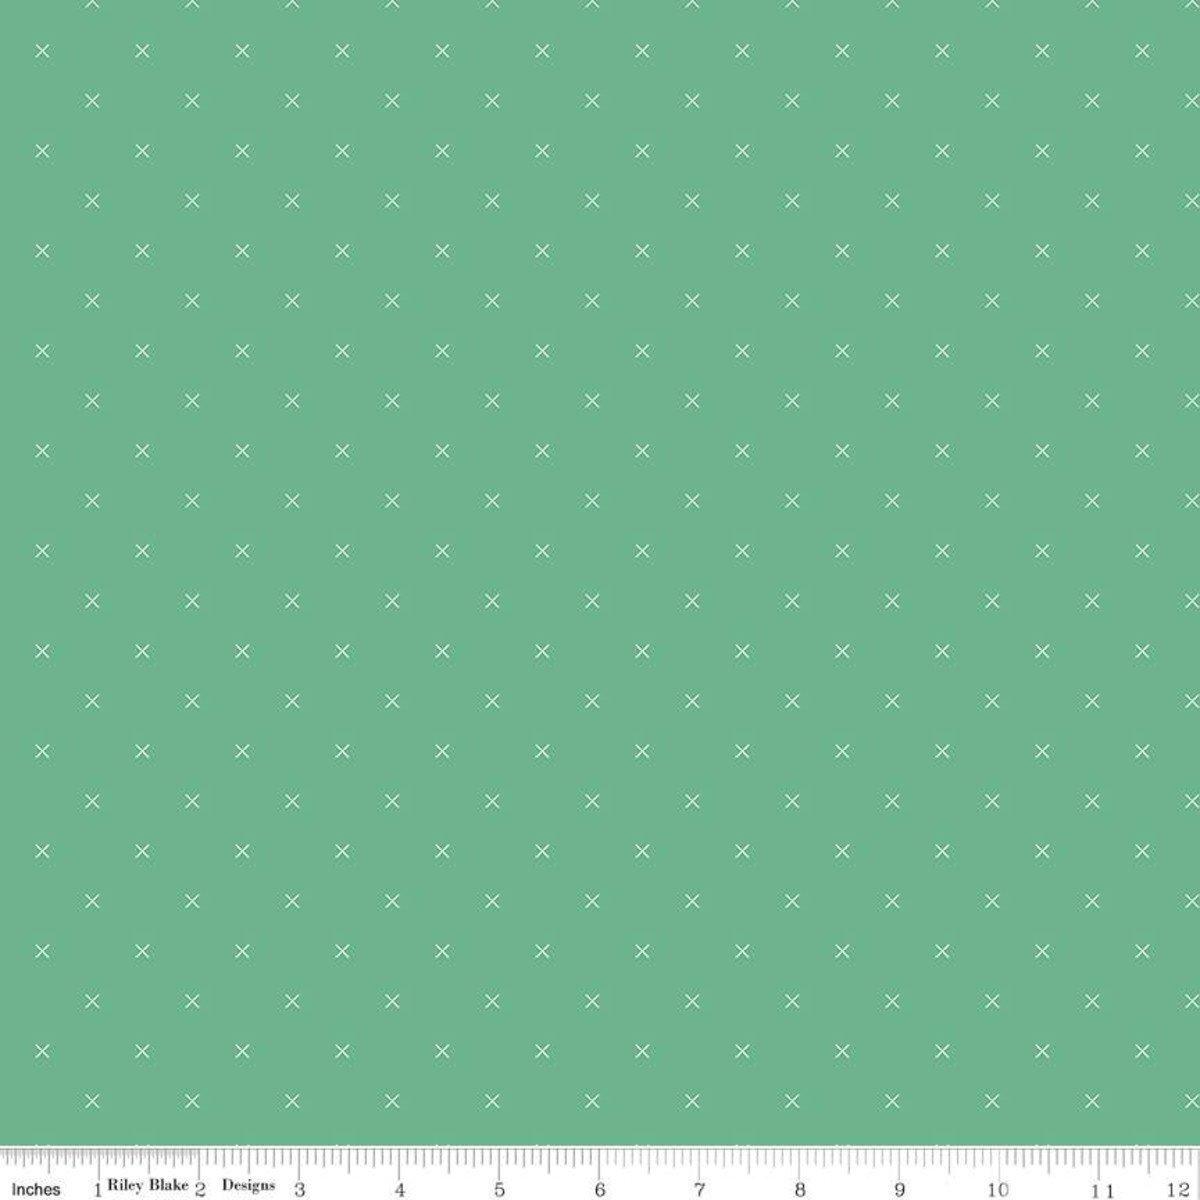 Bee Cross Stitch - Alpine Cross Stitch - By Lori Holt For Riley Blake Designs